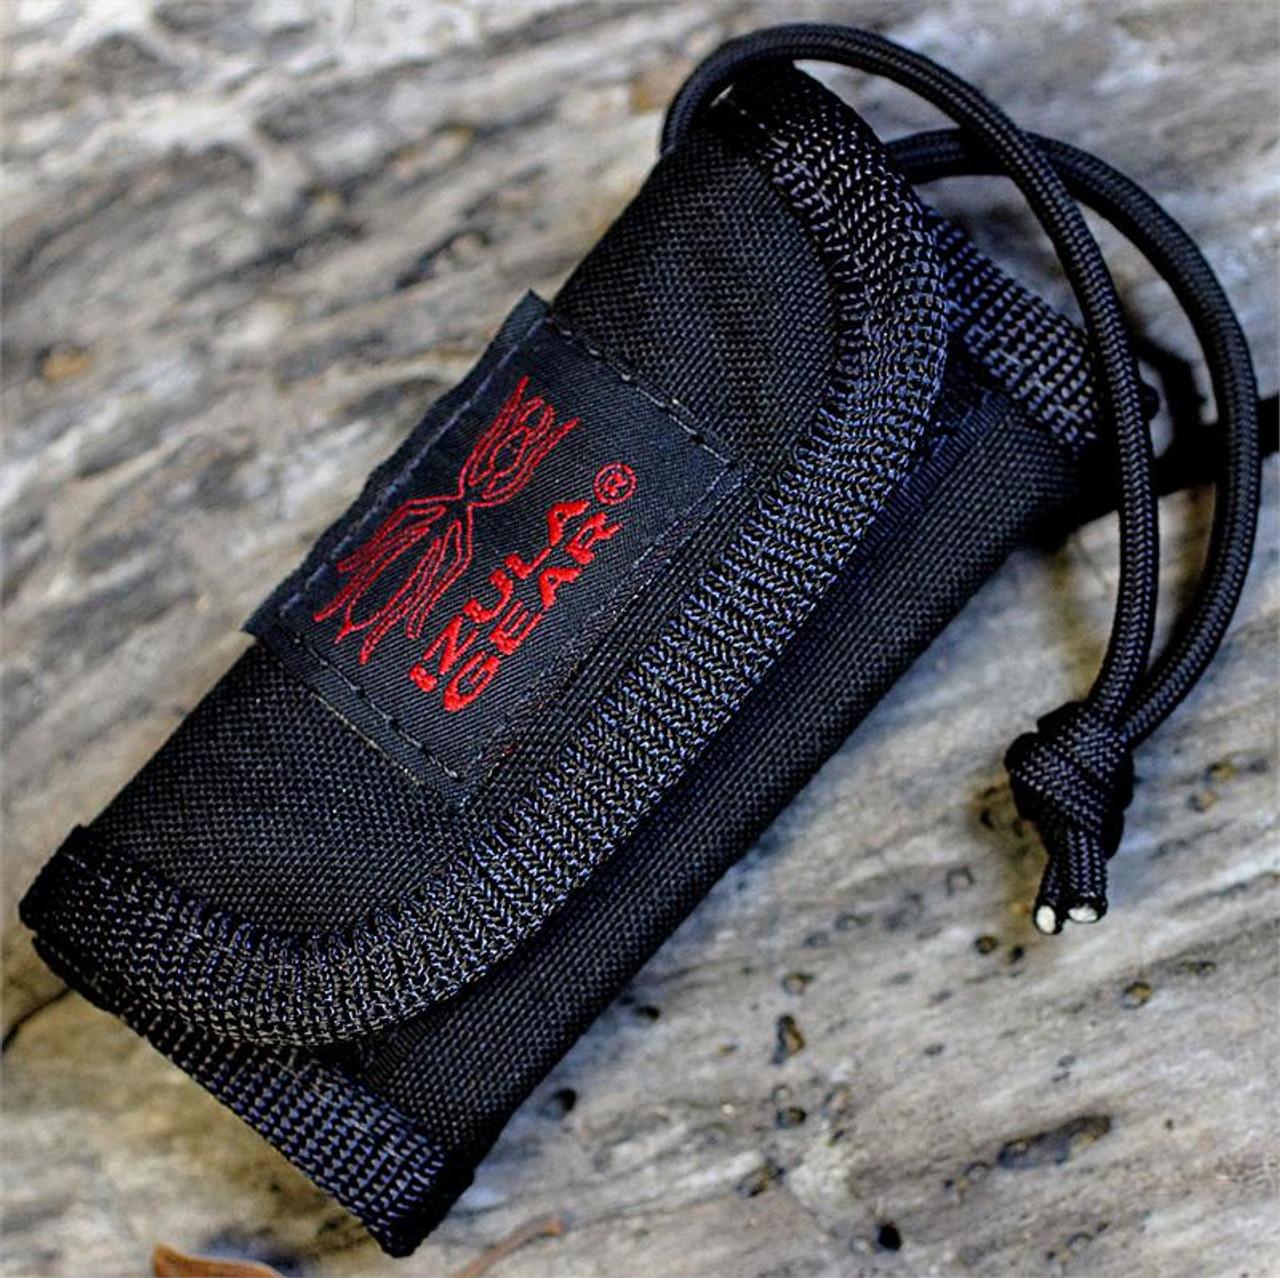 ESEE Arrow Wallet, Izula Gear, AH-1 Arrowhead Wallet